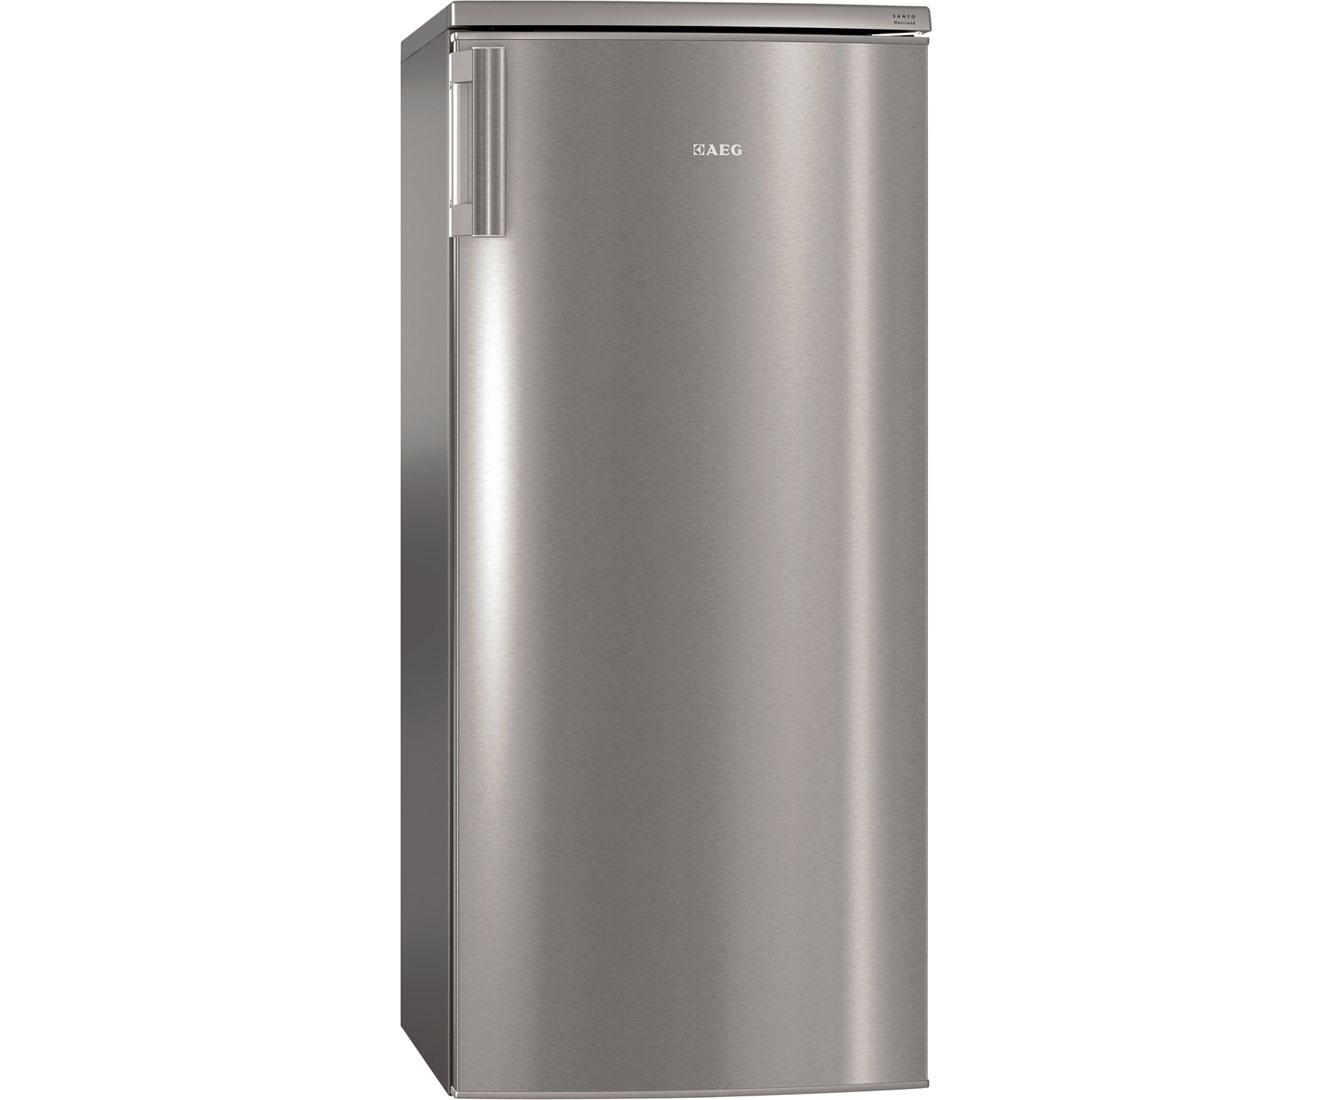 Aeg Kühlschrank Zu Laut : Aeg santo s kss kühlschrank edelstahl silber a